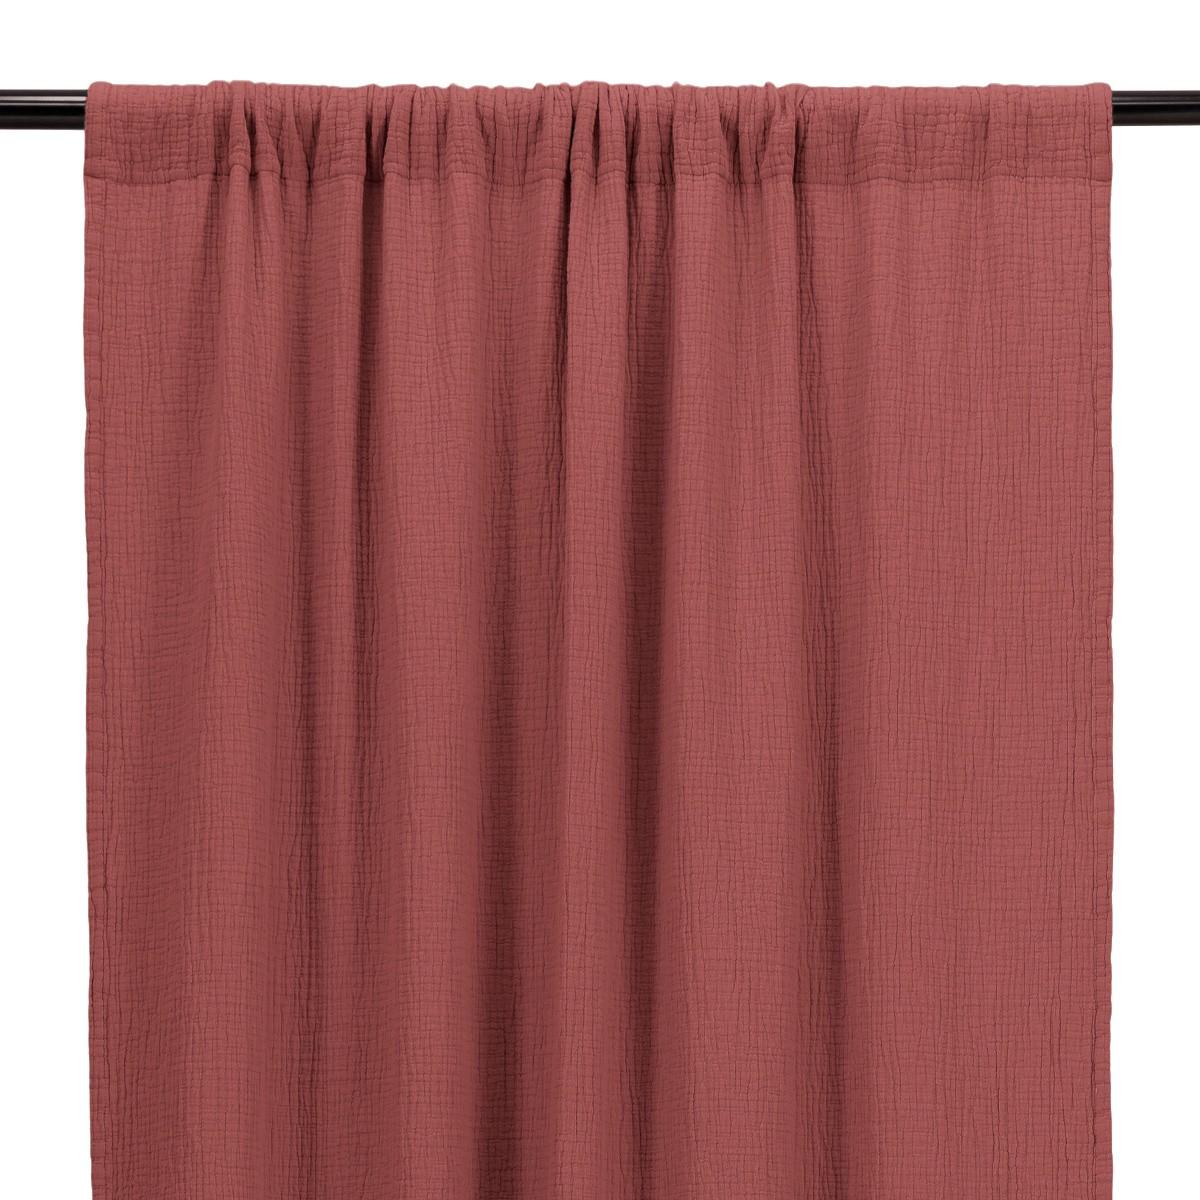 Brick Red Cotton Gauze Bambina Curtain